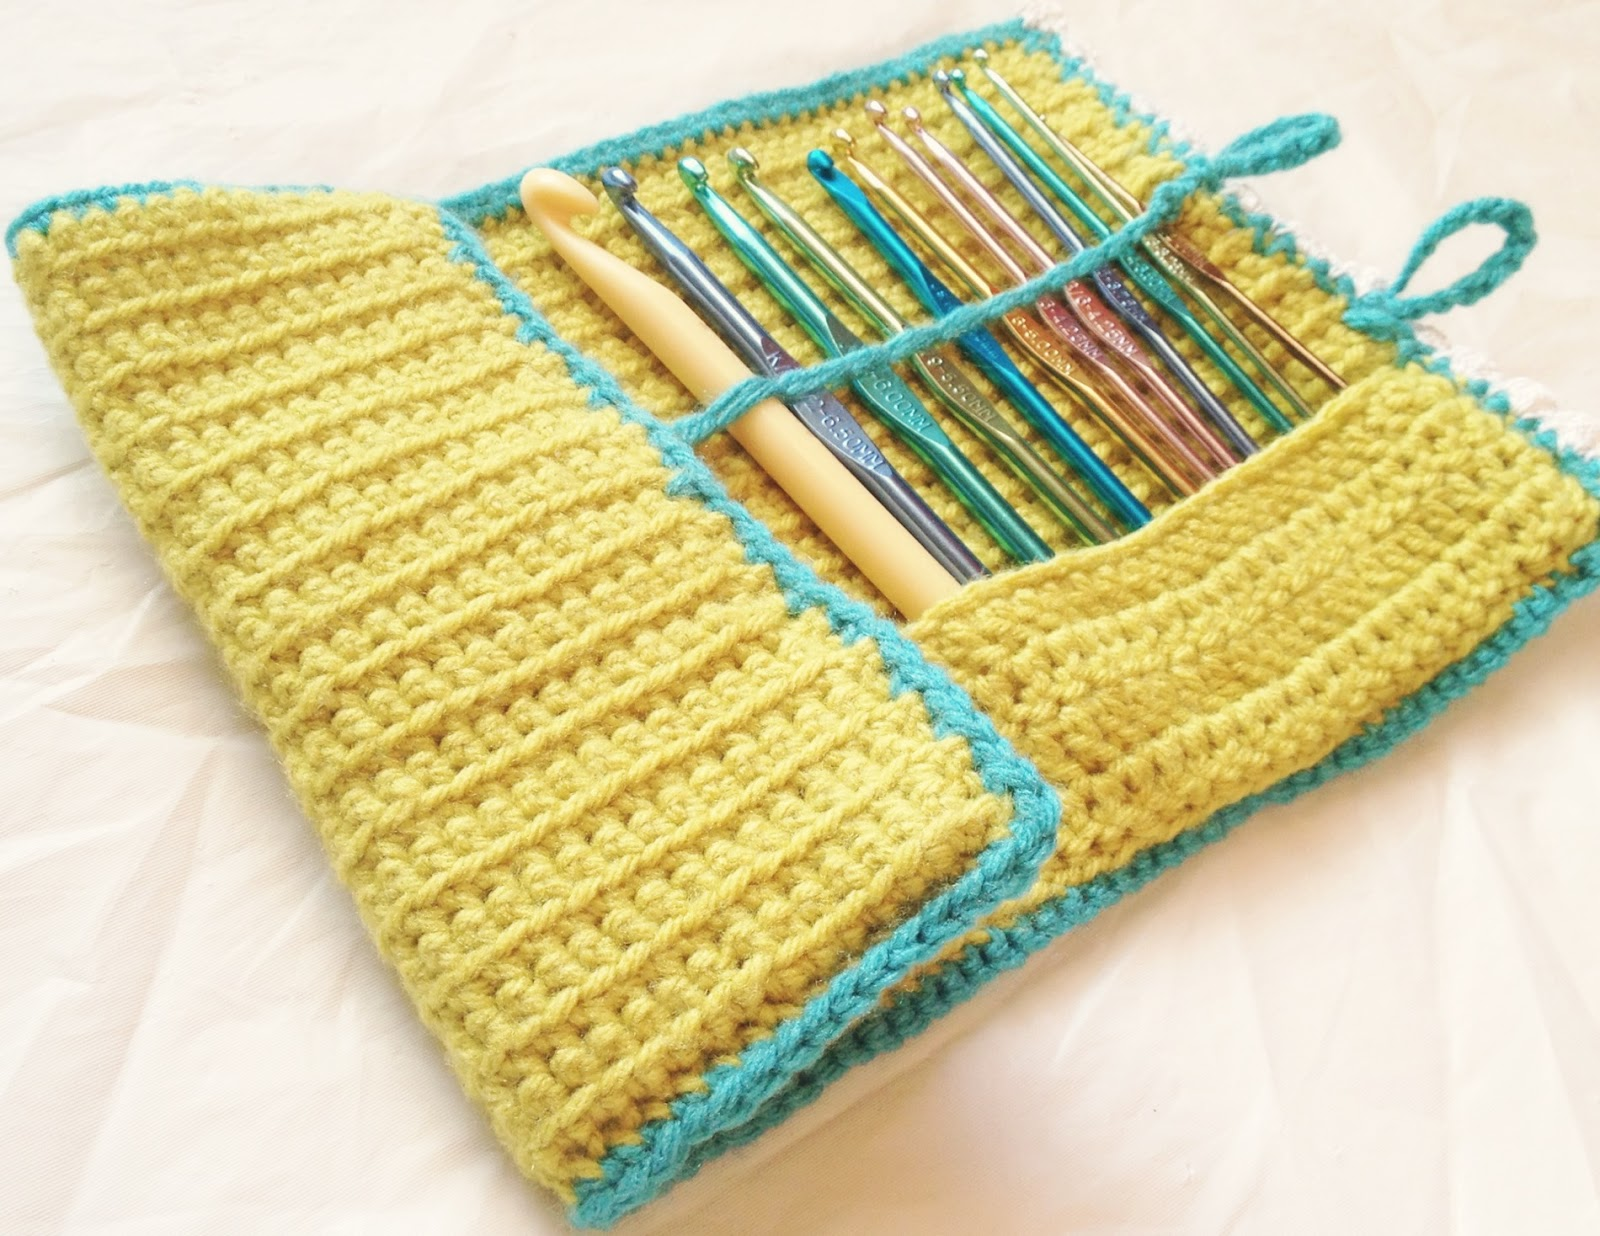 M O T H E R Of B E E E S Diy Crochet Hook Case